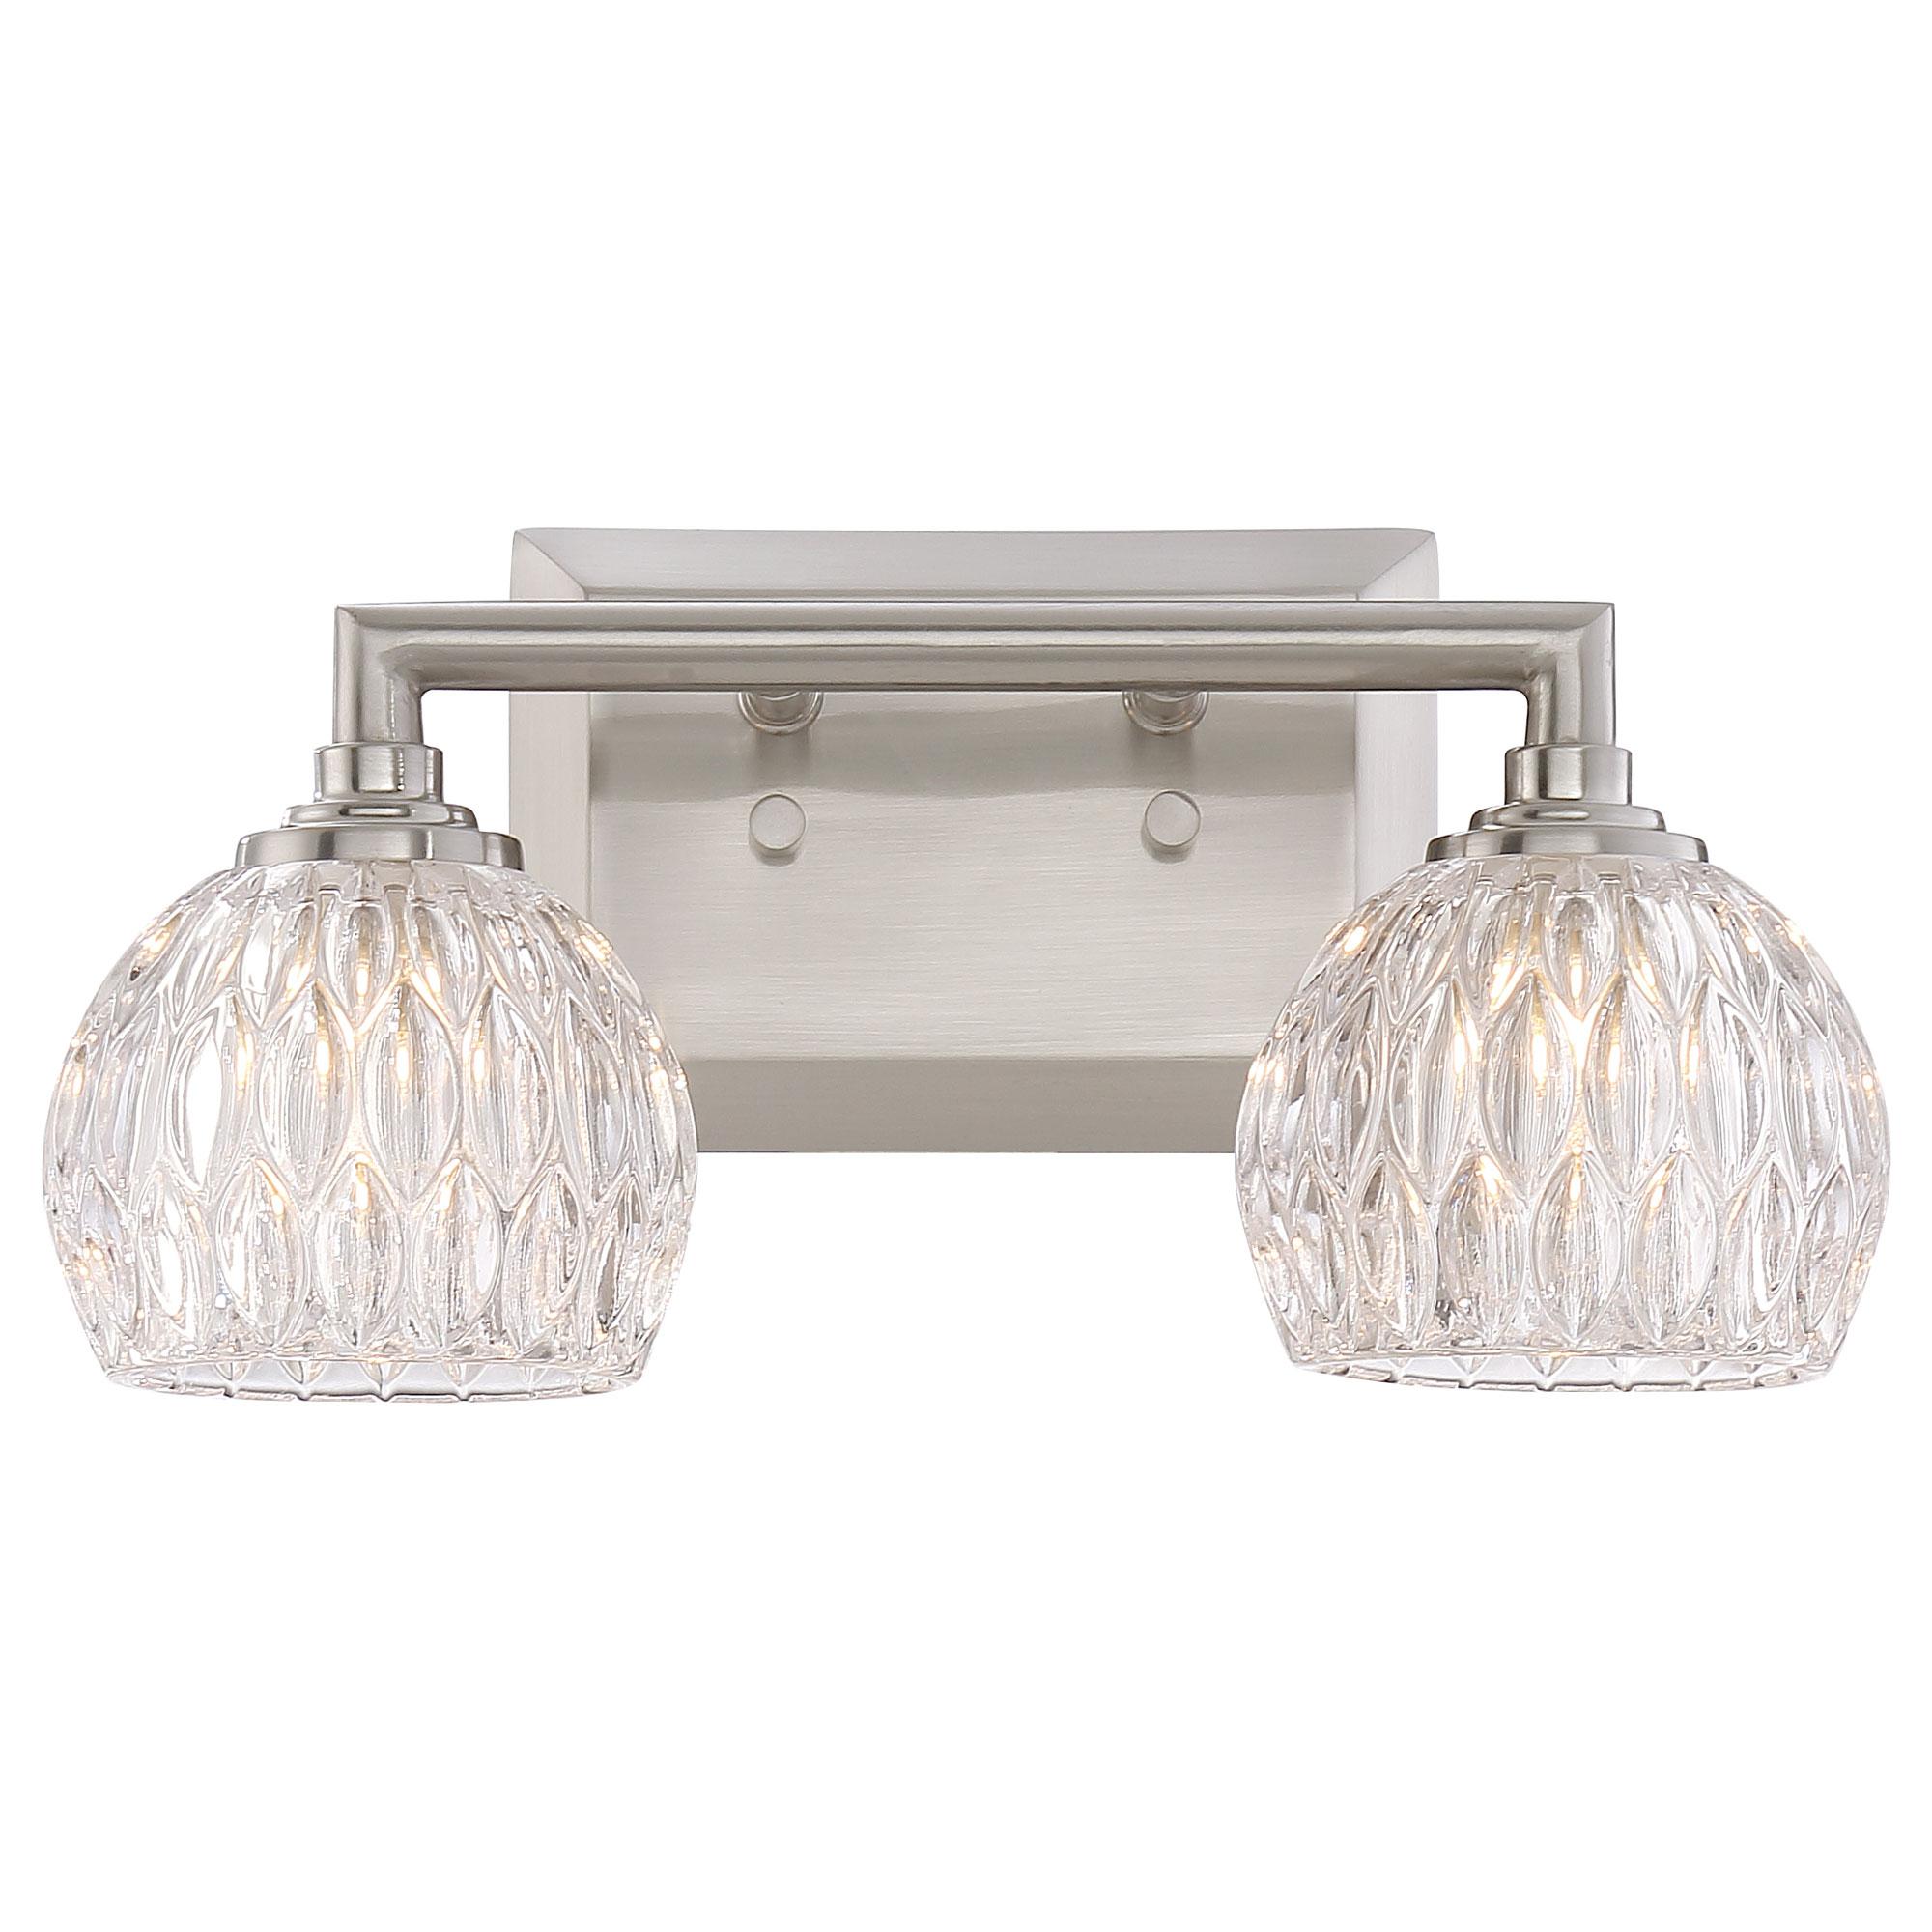 Platinum Serena Bathroom Vanity Light By Quoizel   PCSA8602BNLED